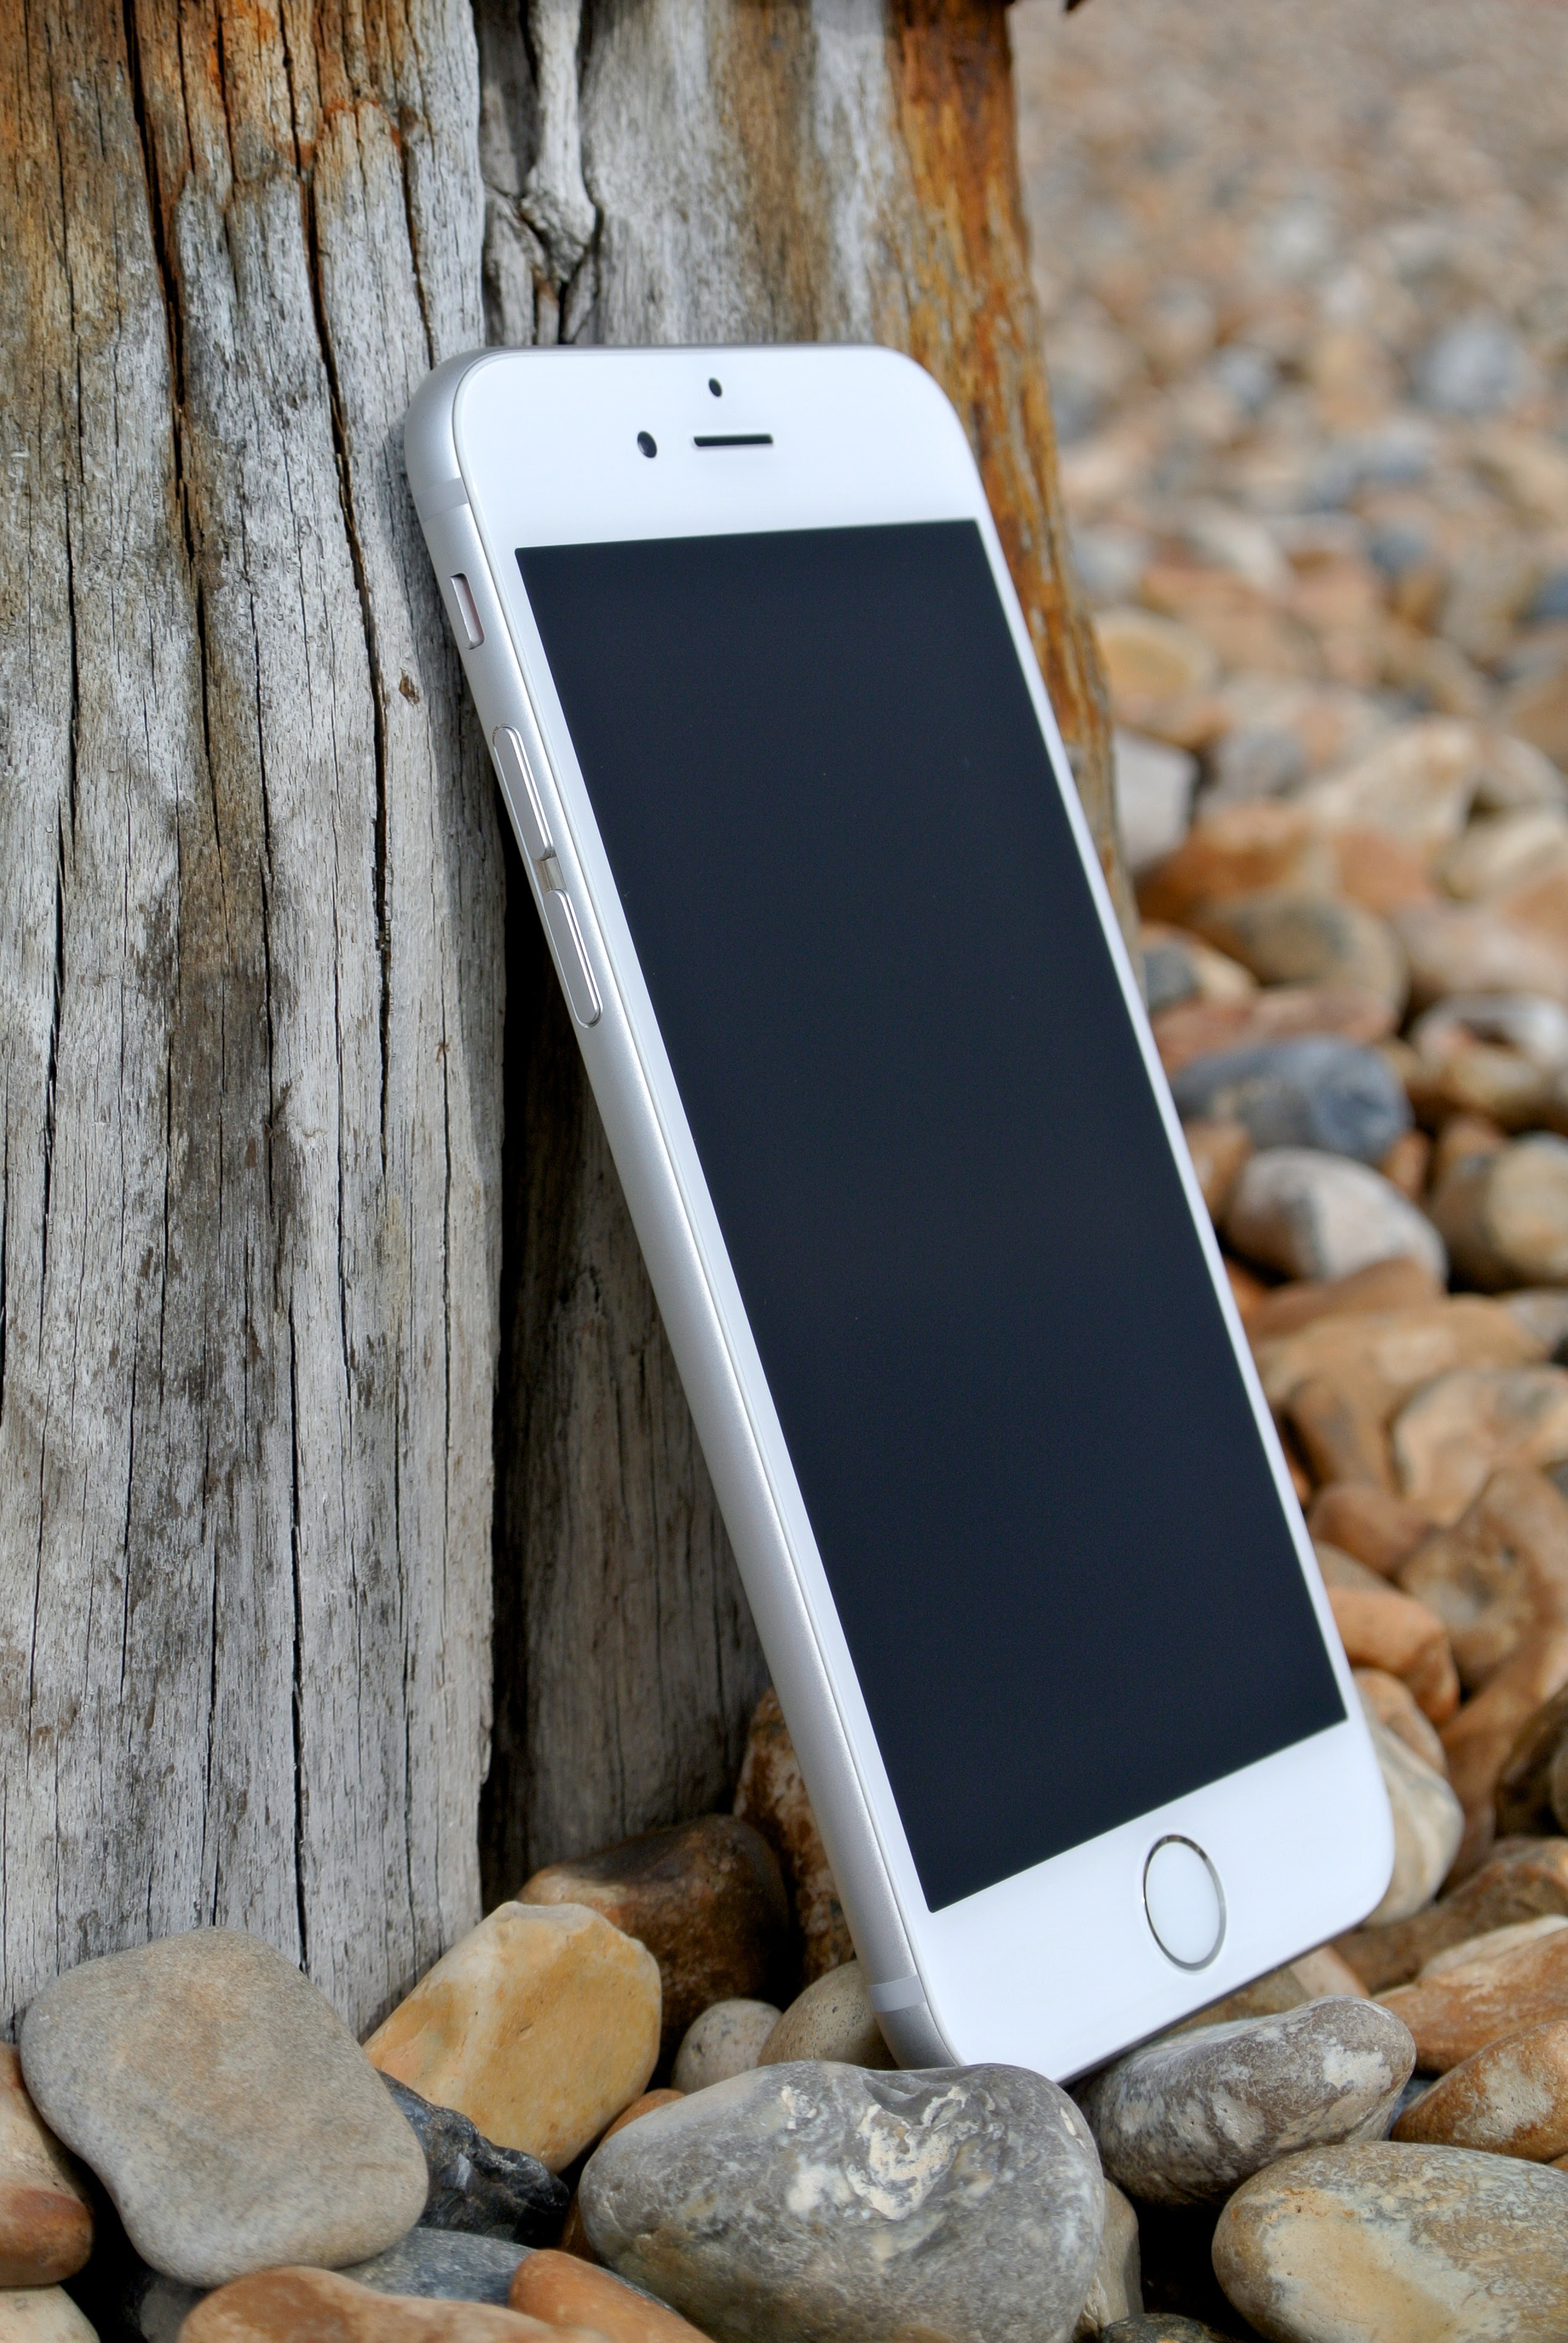 Silver Iphone 6  C2 B7 Free Stock Photo